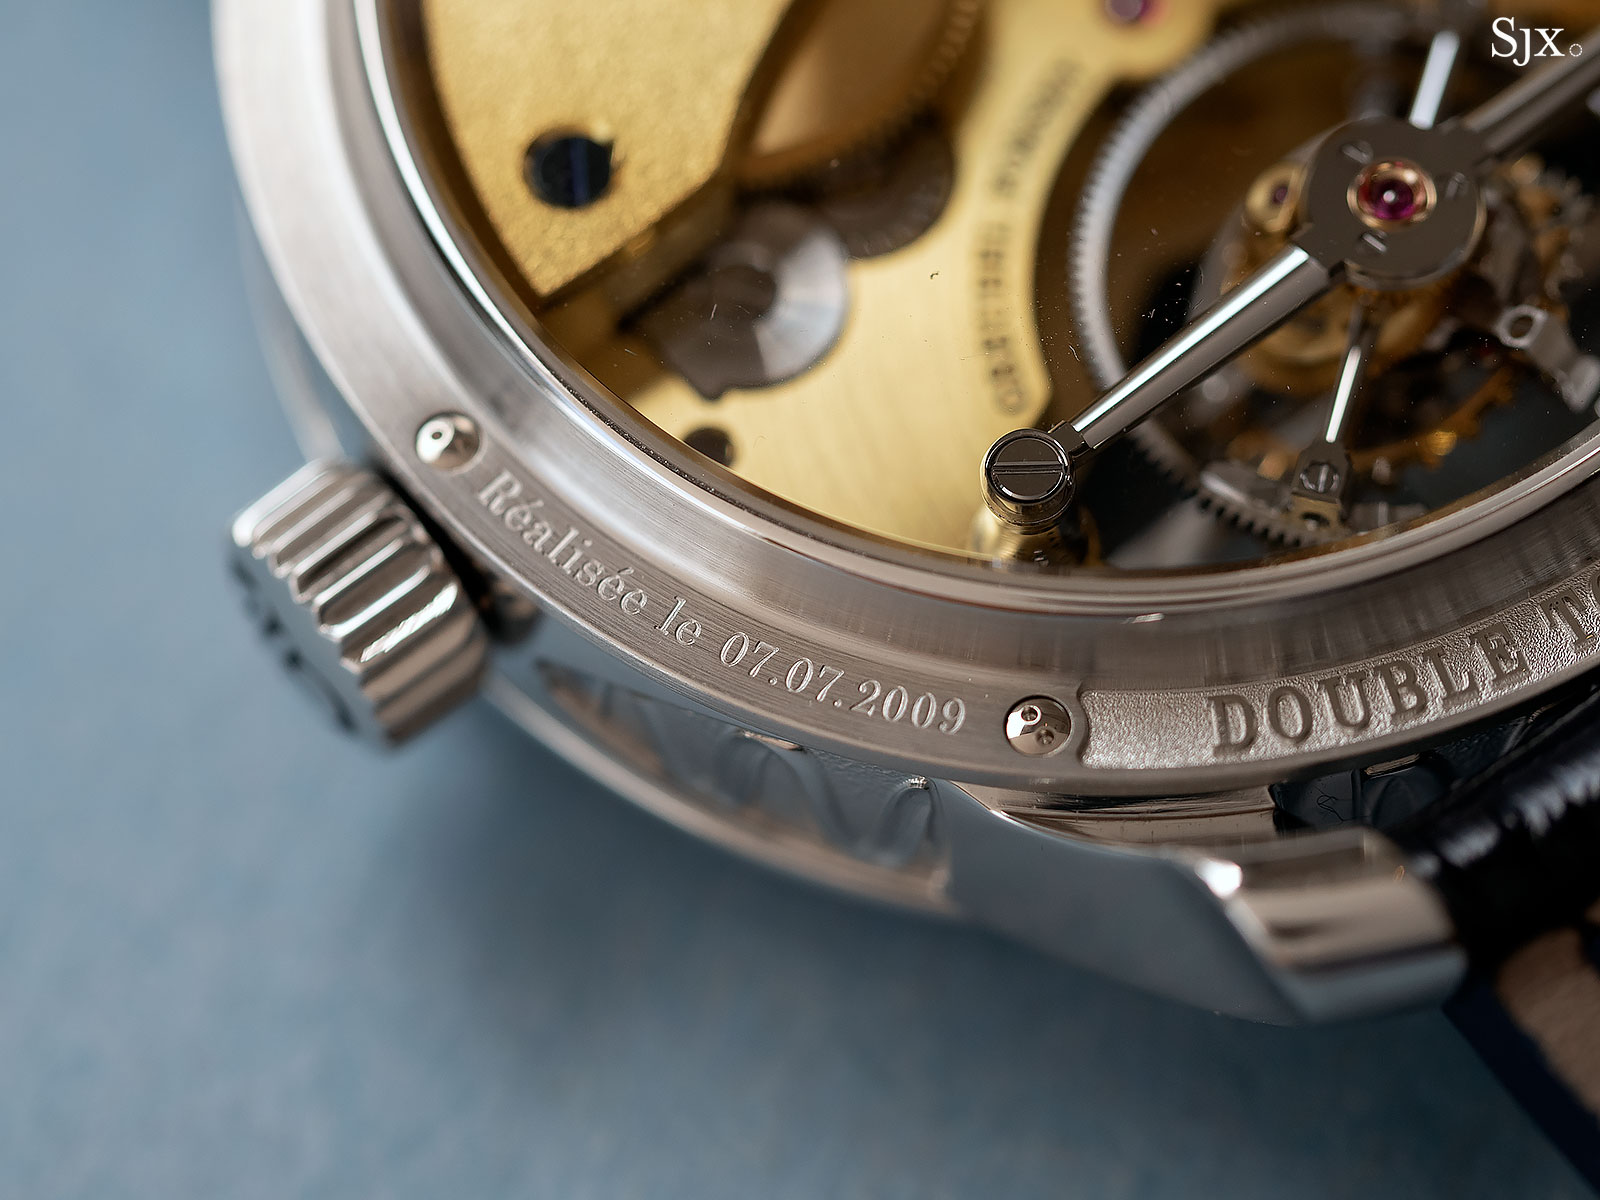 Greubel Forsey Double Tourbillon 30 Jean Claude Biver 9